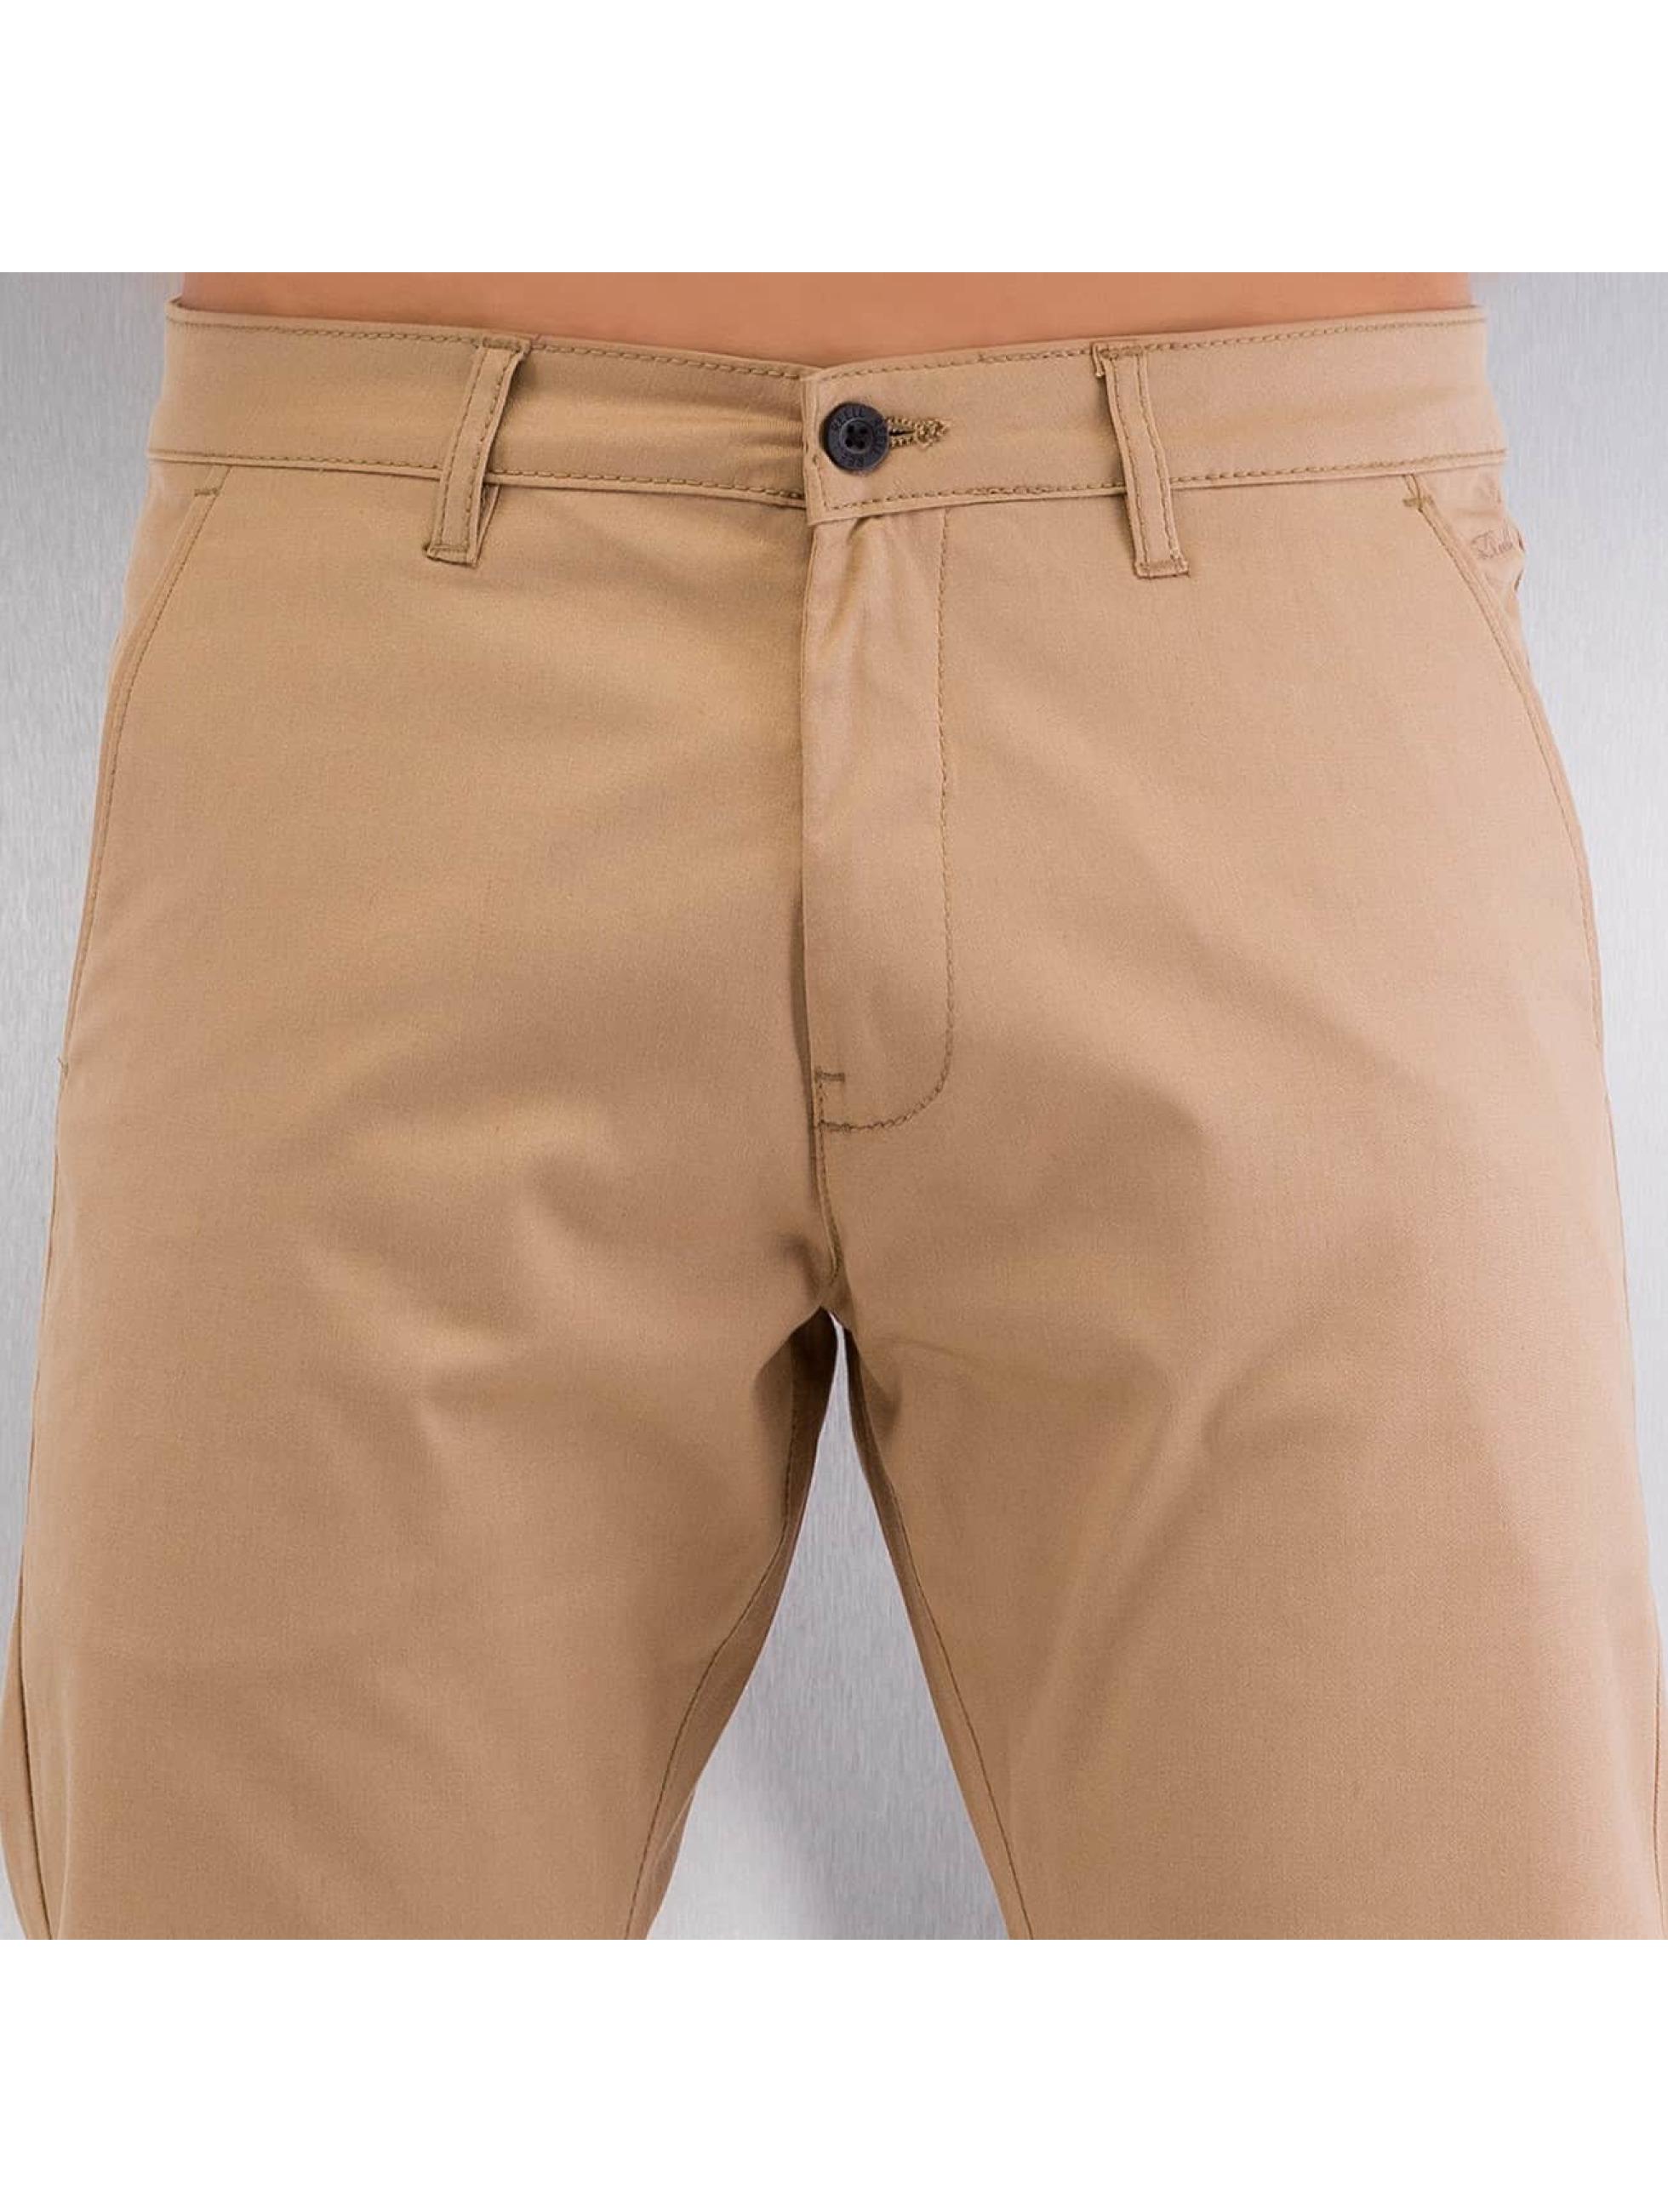 Reell Jeans Pantalon chino Straight Flex beige